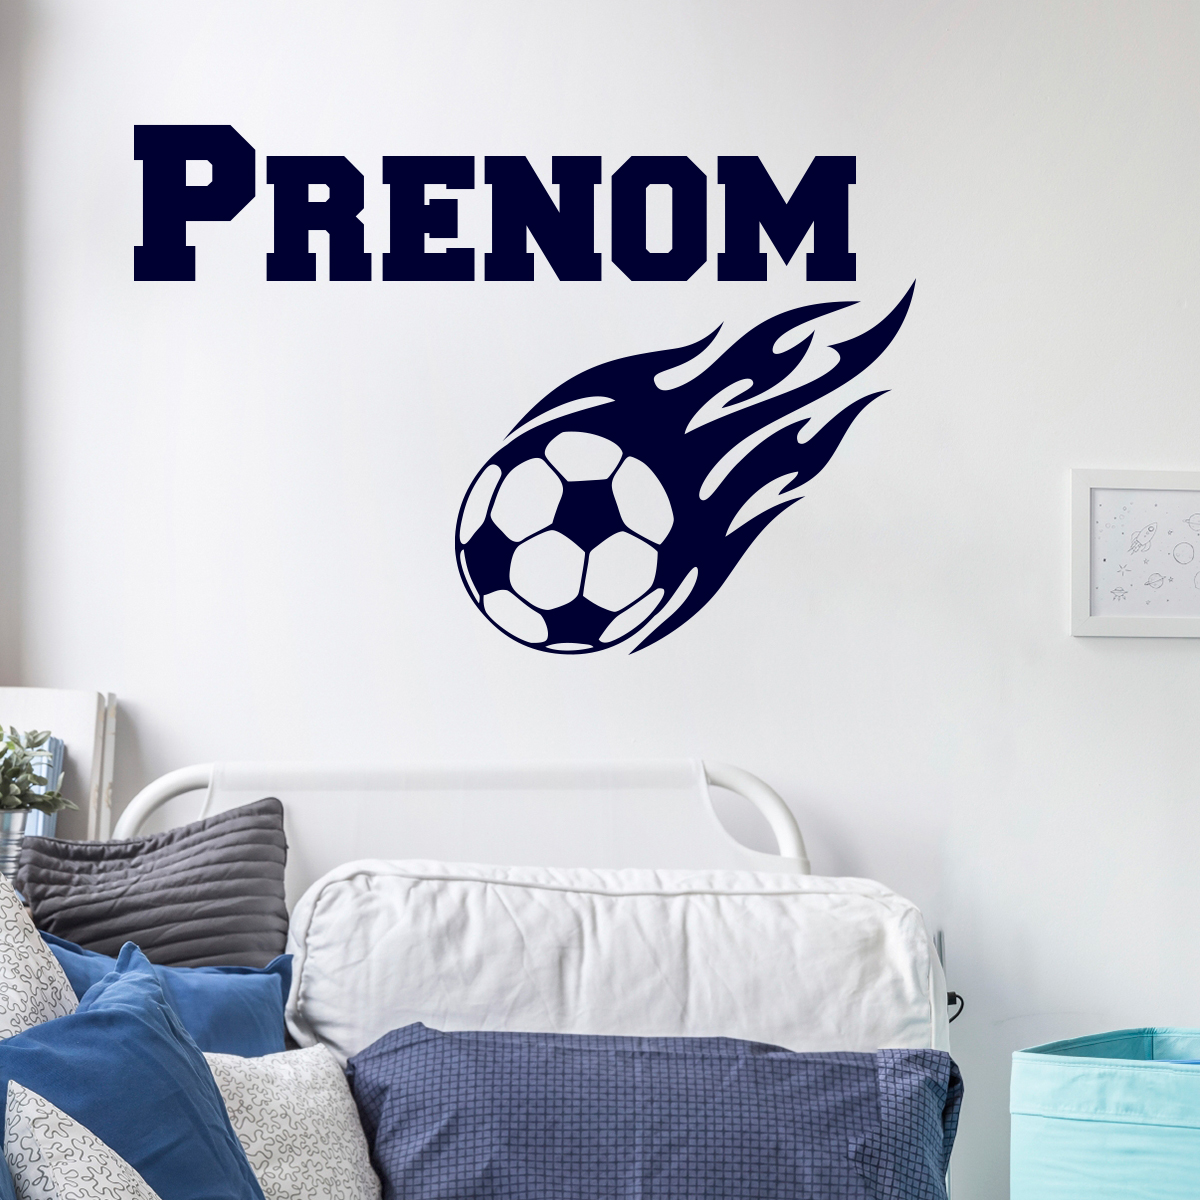 sticker pr nom personnalisable ballon de football enflamm. Black Bedroom Furniture Sets. Home Design Ideas